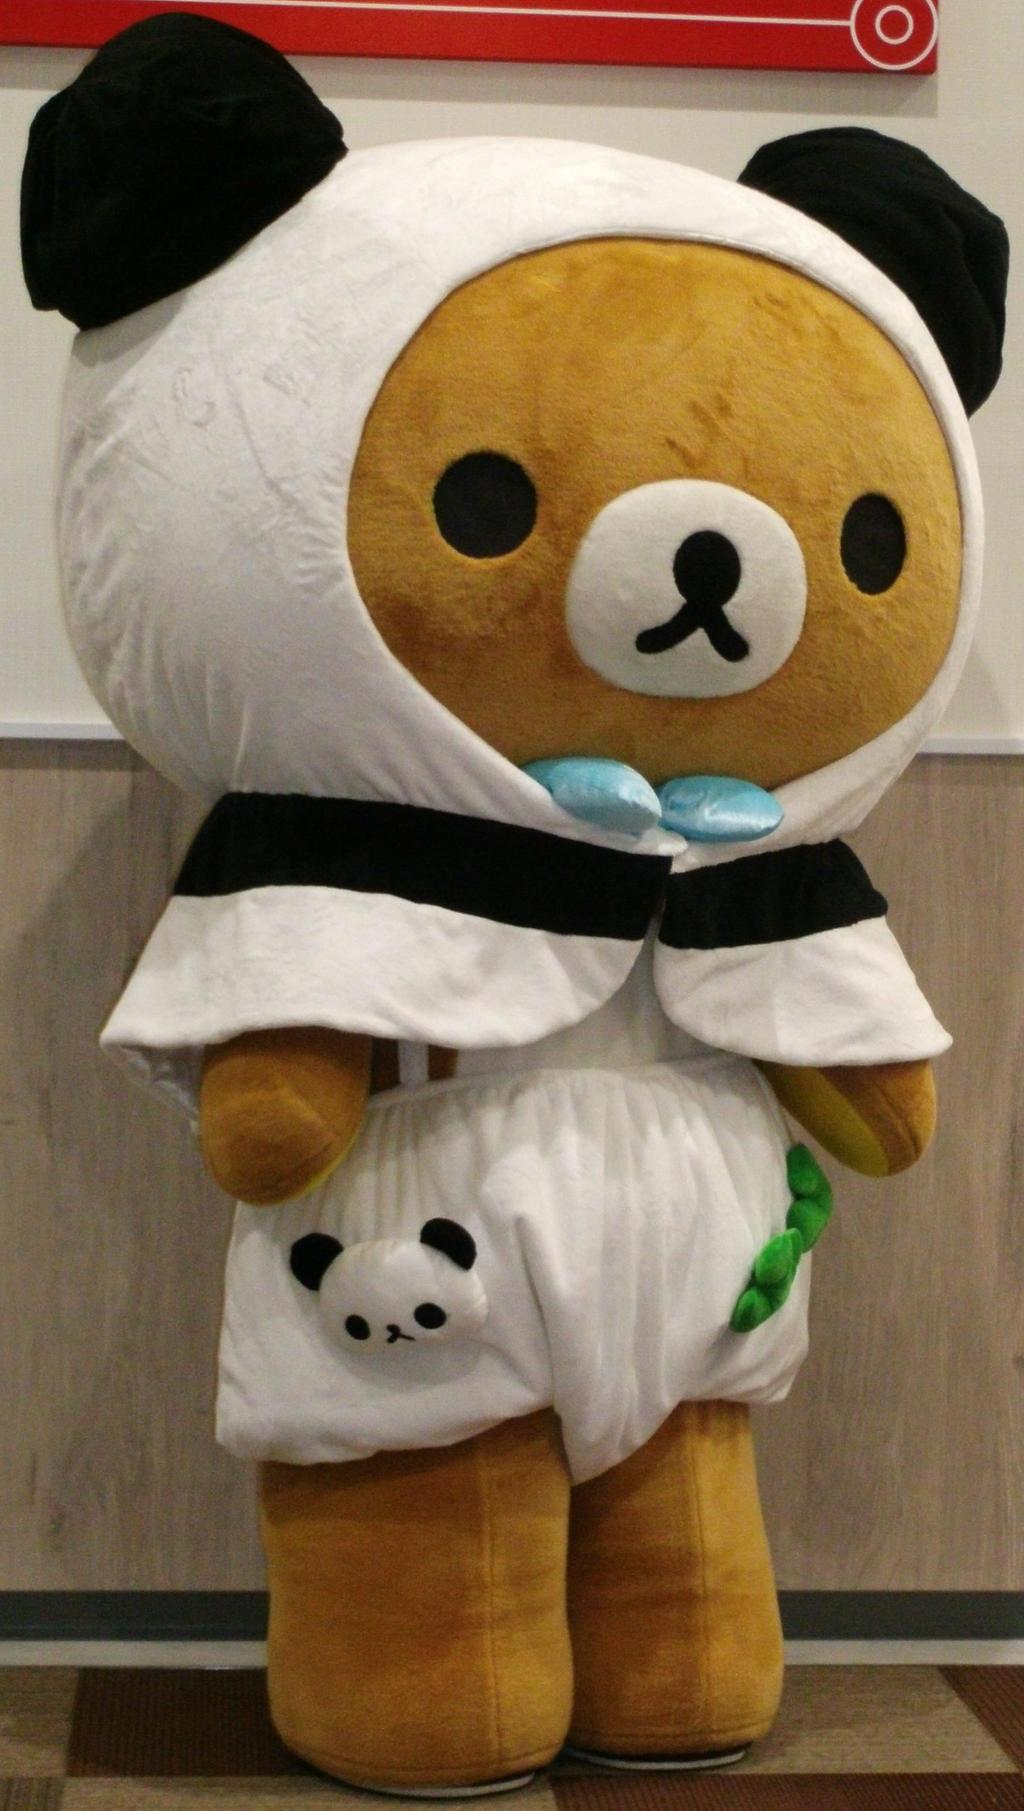 Rilakkuma meets Panda de goron 2 by yellowmocha